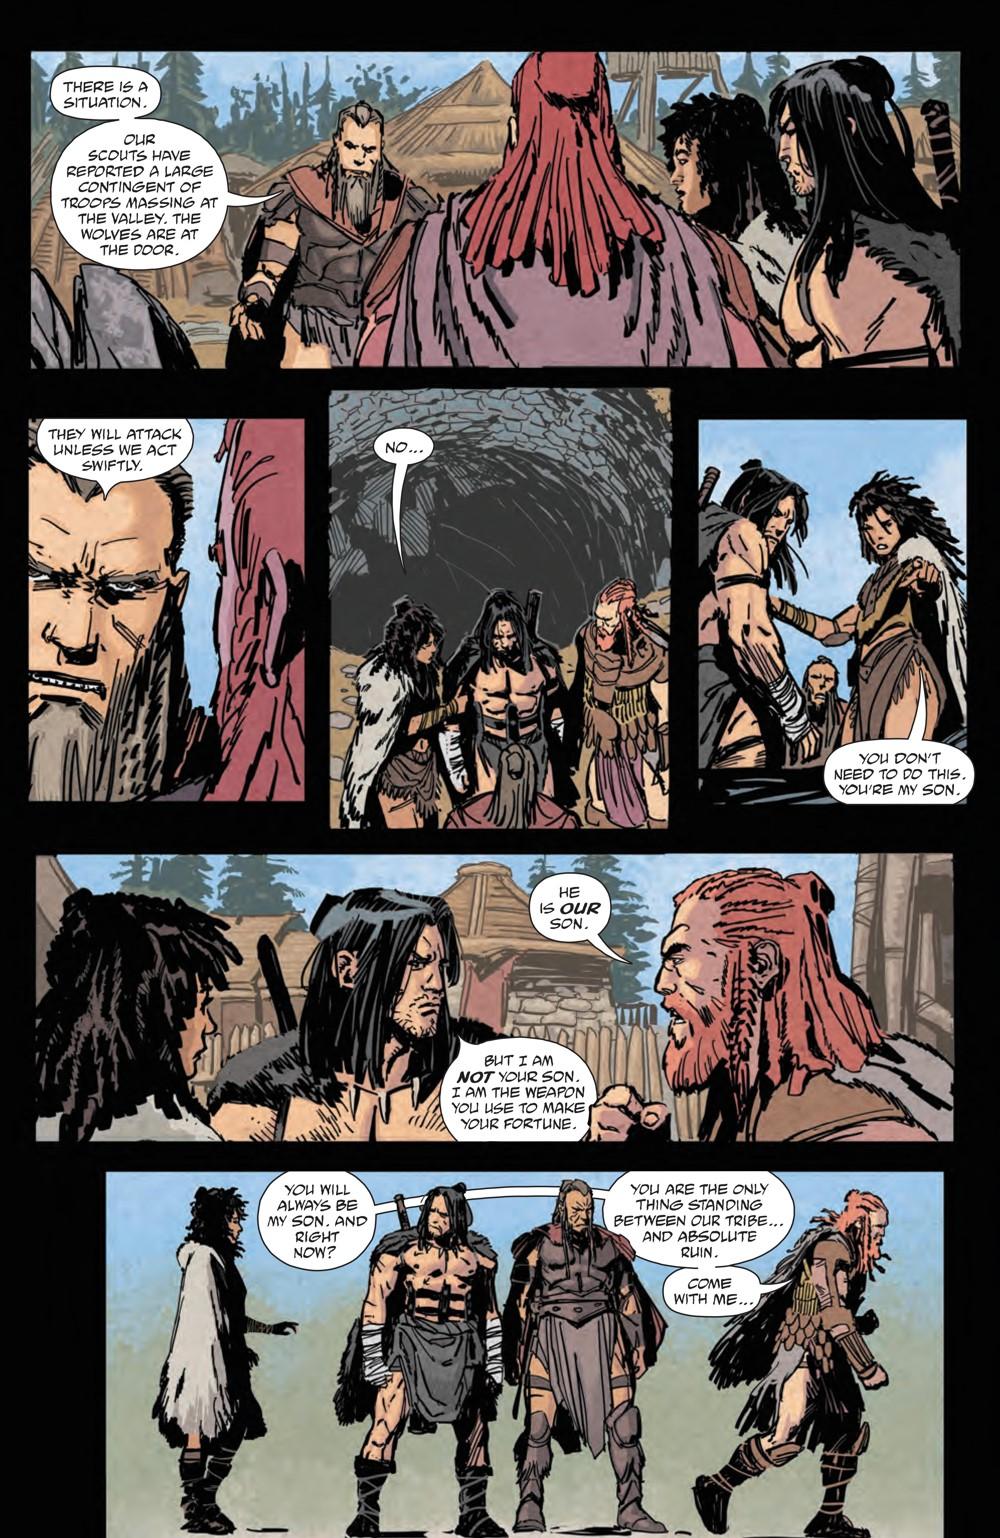 BRZRKR_004_PRESS_6 ComicList Previews: BRZRKR #4 (OF 12)